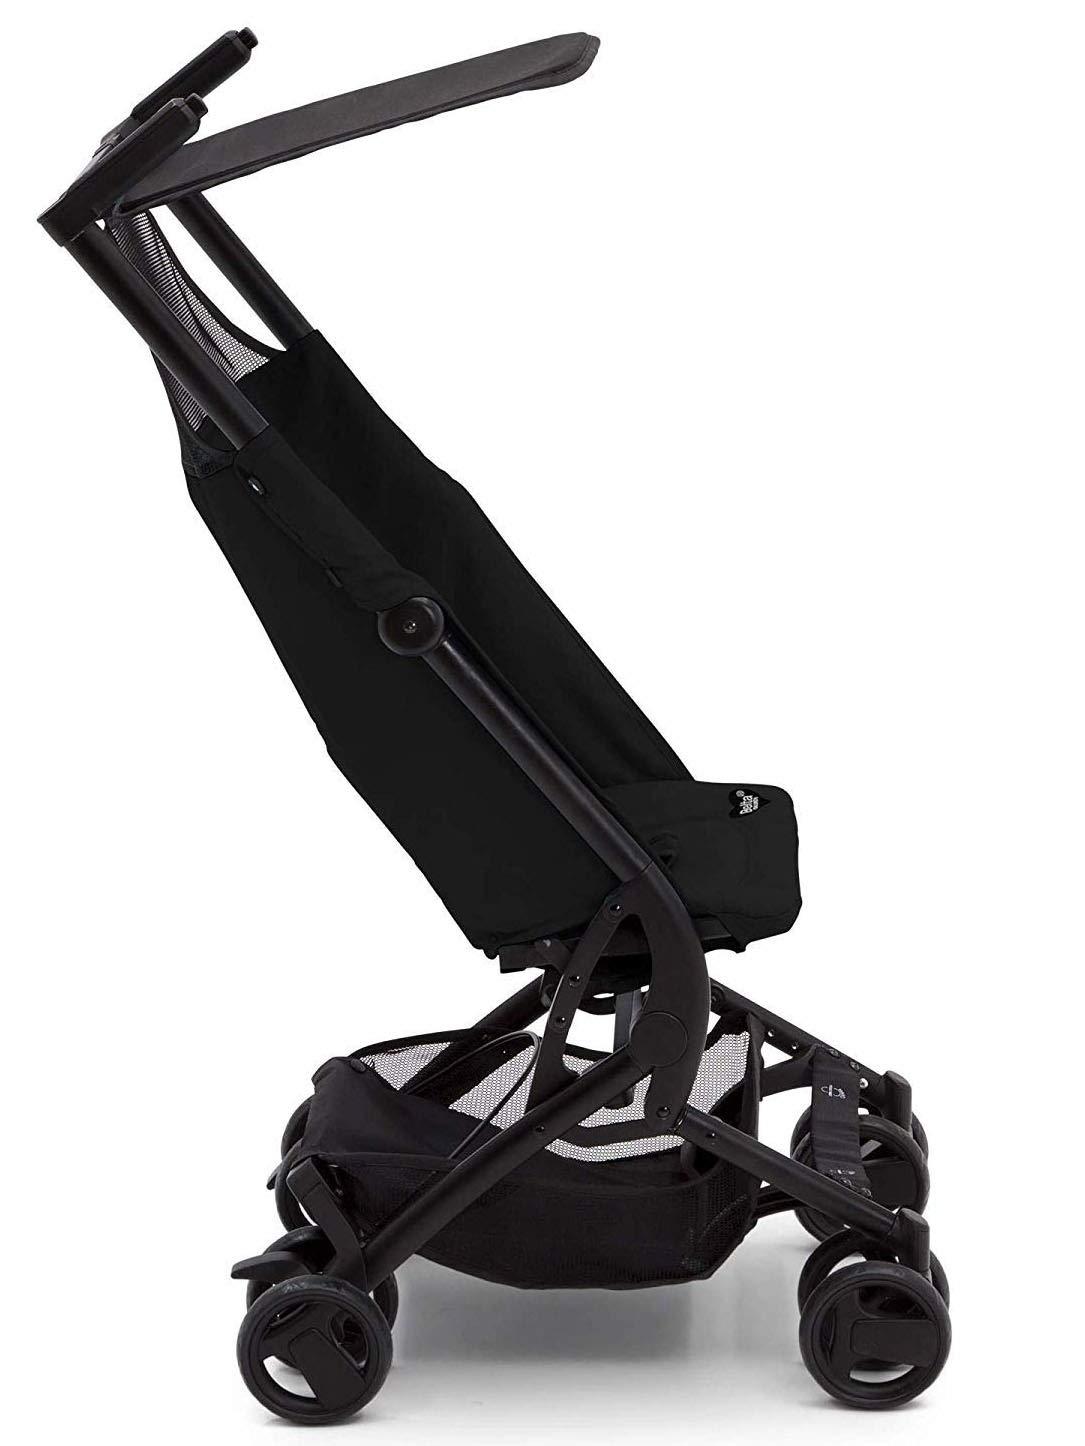 The Clutch Stroller by Delta Children - Lightweight Compact Folding Stroller - Includes Travel Bag - Fits Airplane Overhead Storage - Black by Delta Children (Image #6)